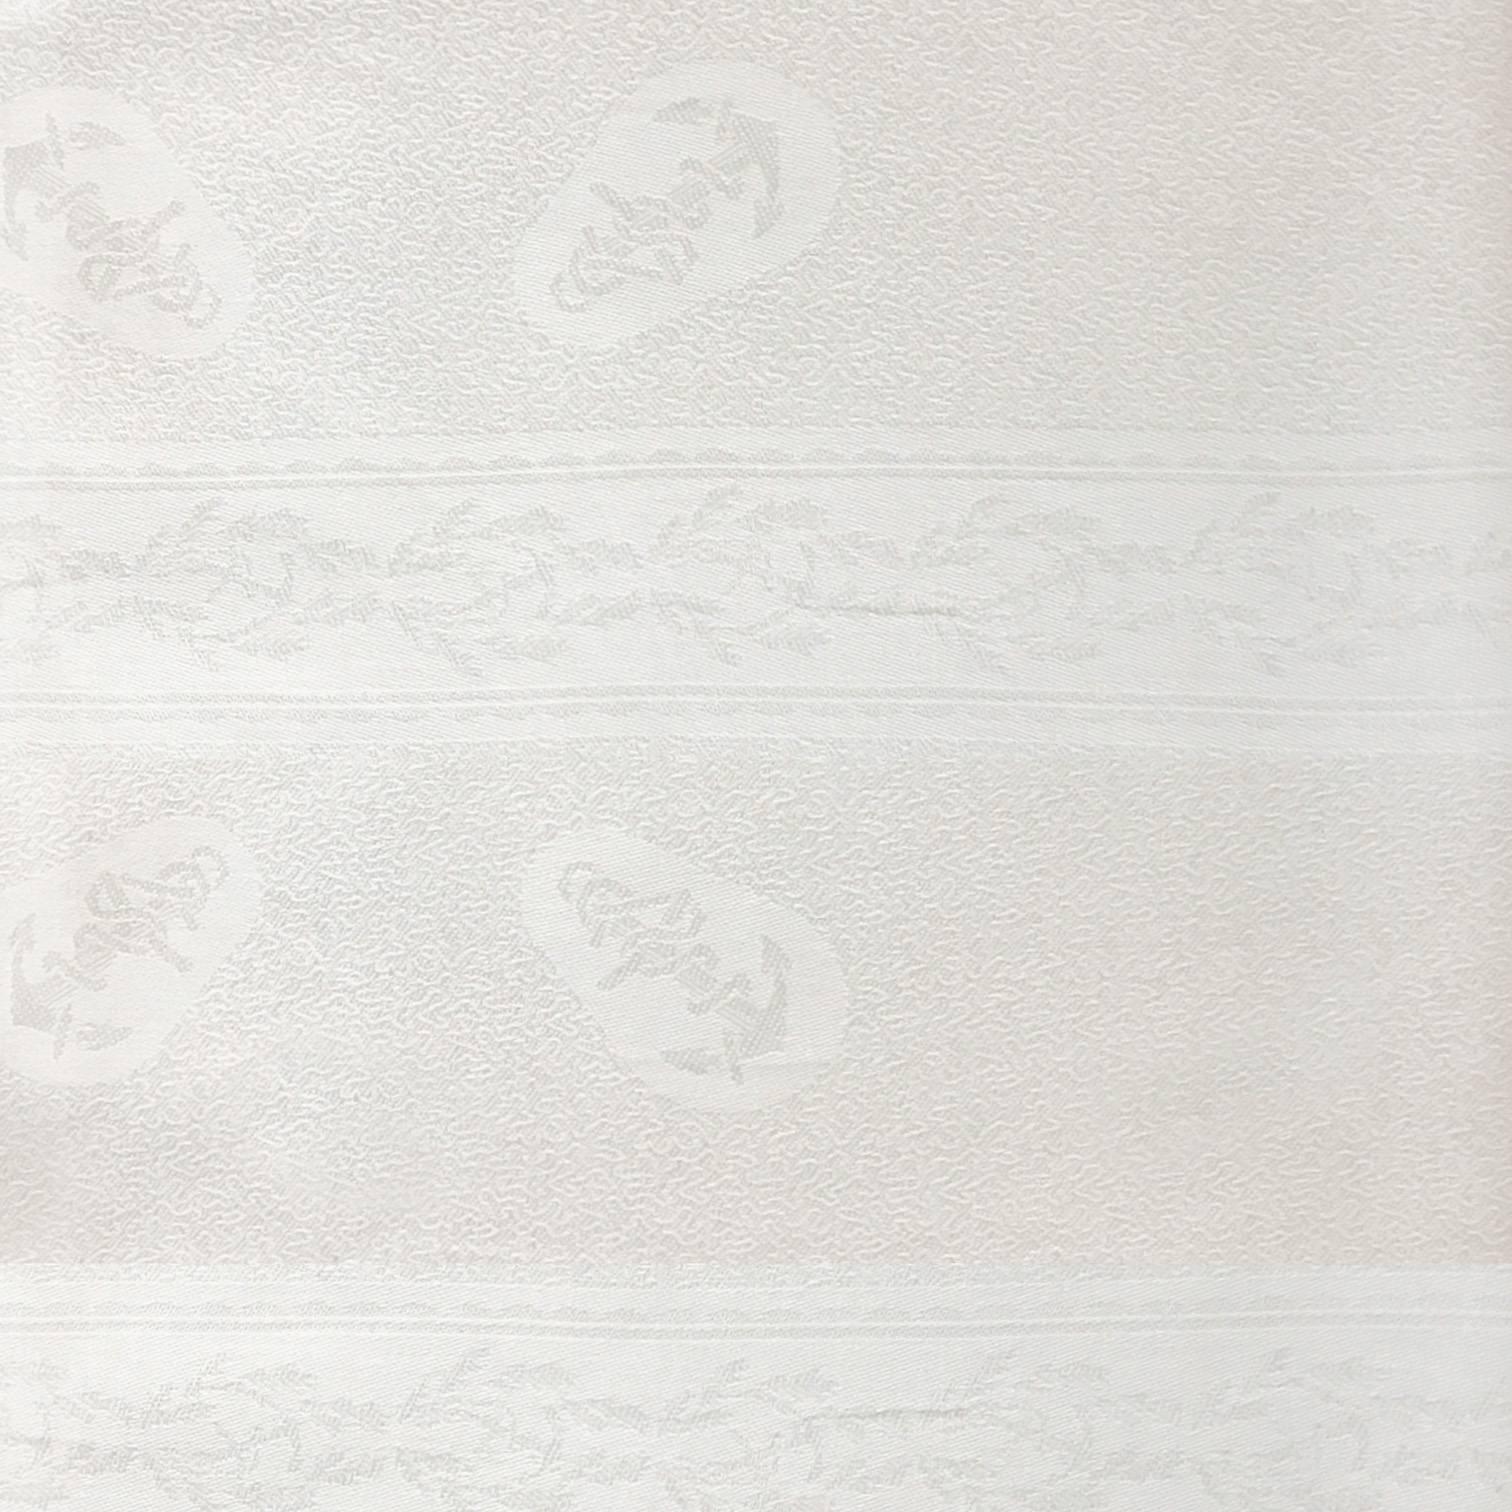 Tissu jacquard damassé blanc motif ancre marine 182 cm